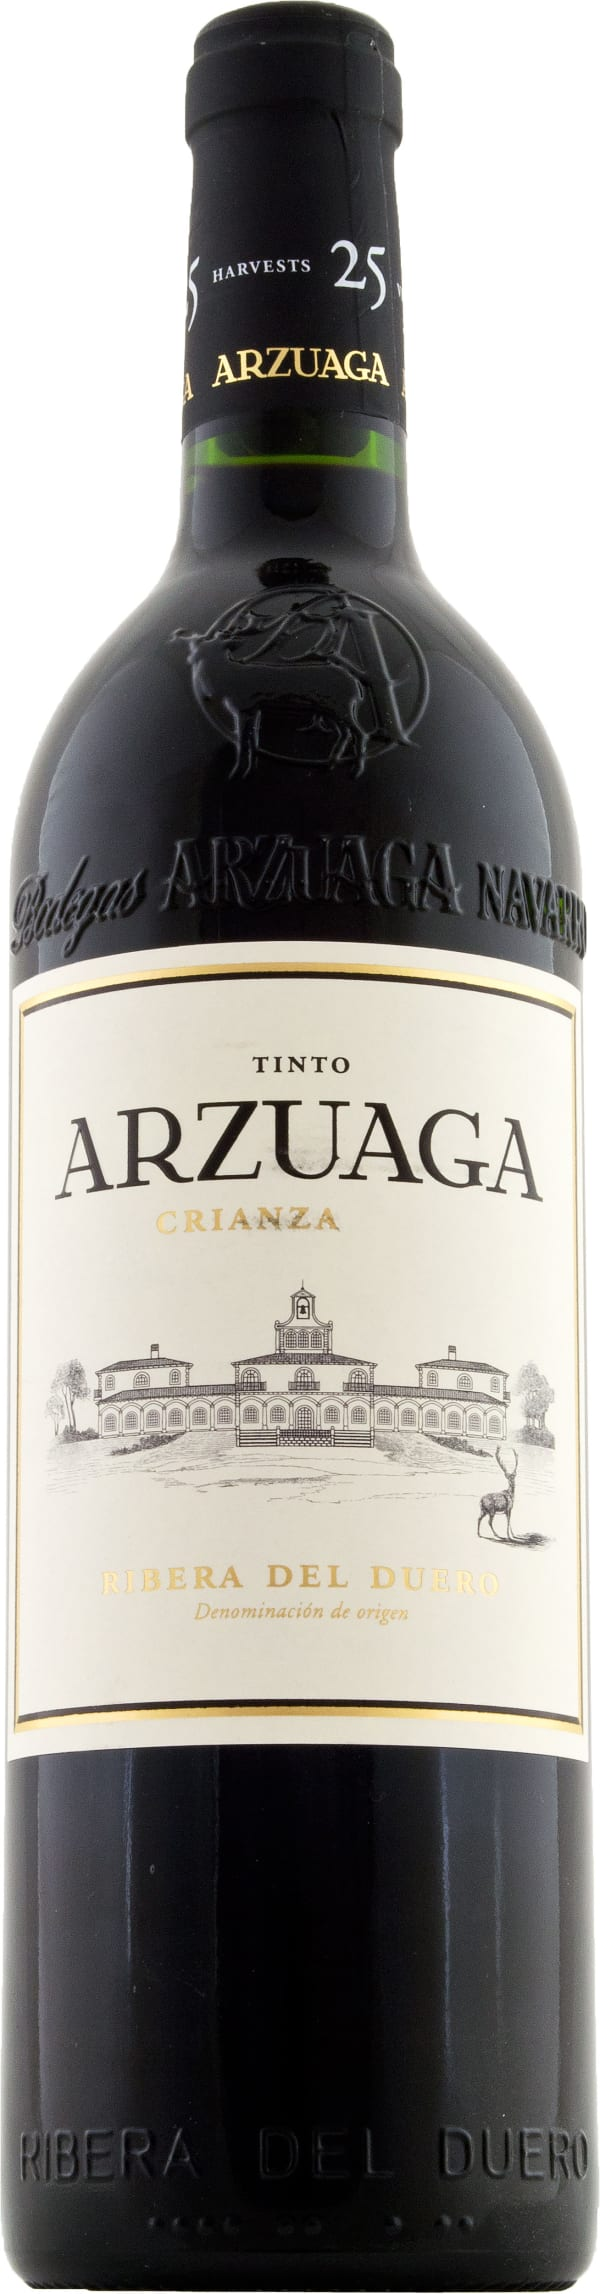 Arzuaga Crianza 2014